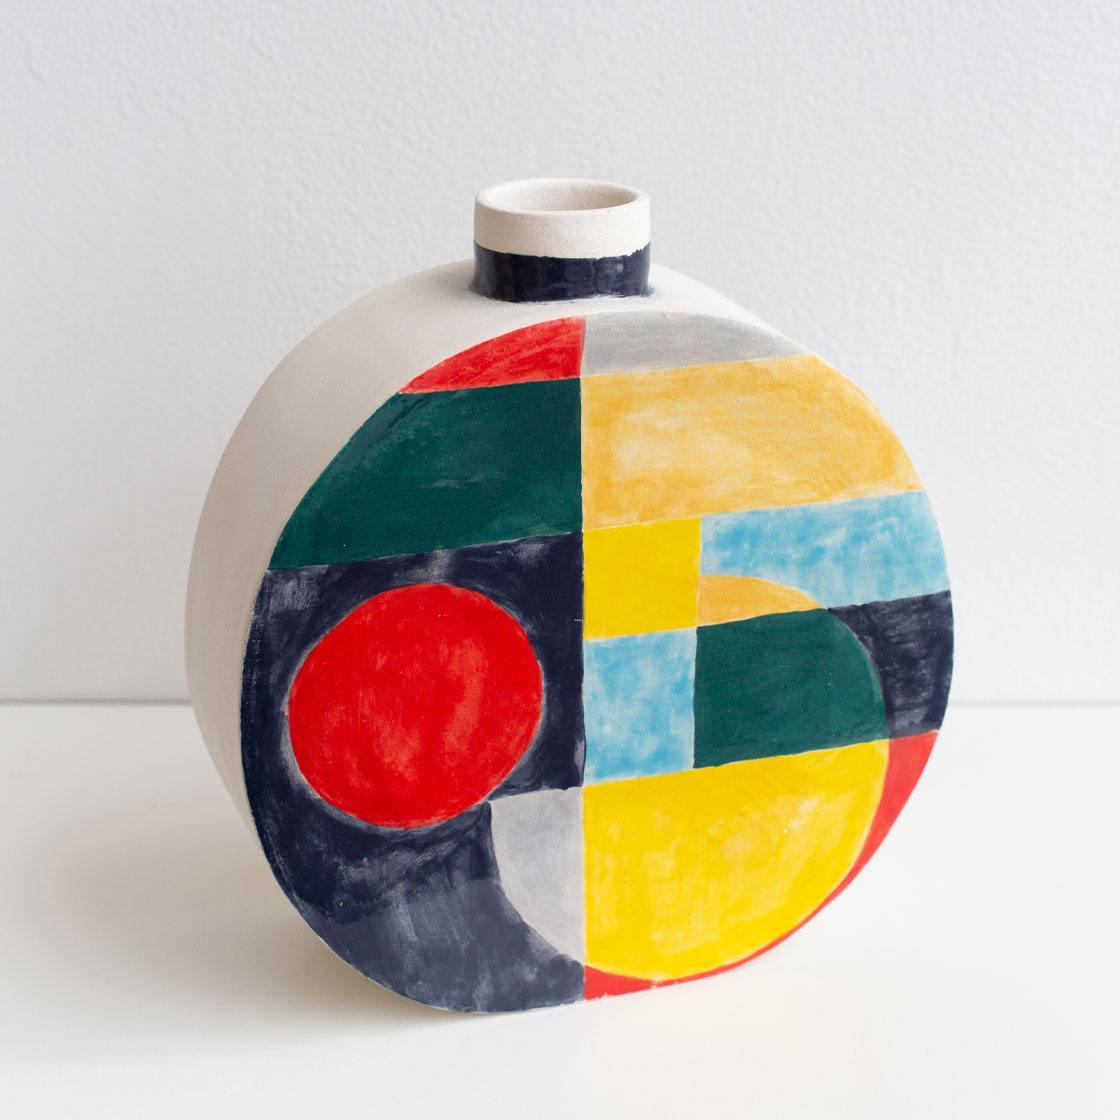 25th anniversary pattern ceramic vase